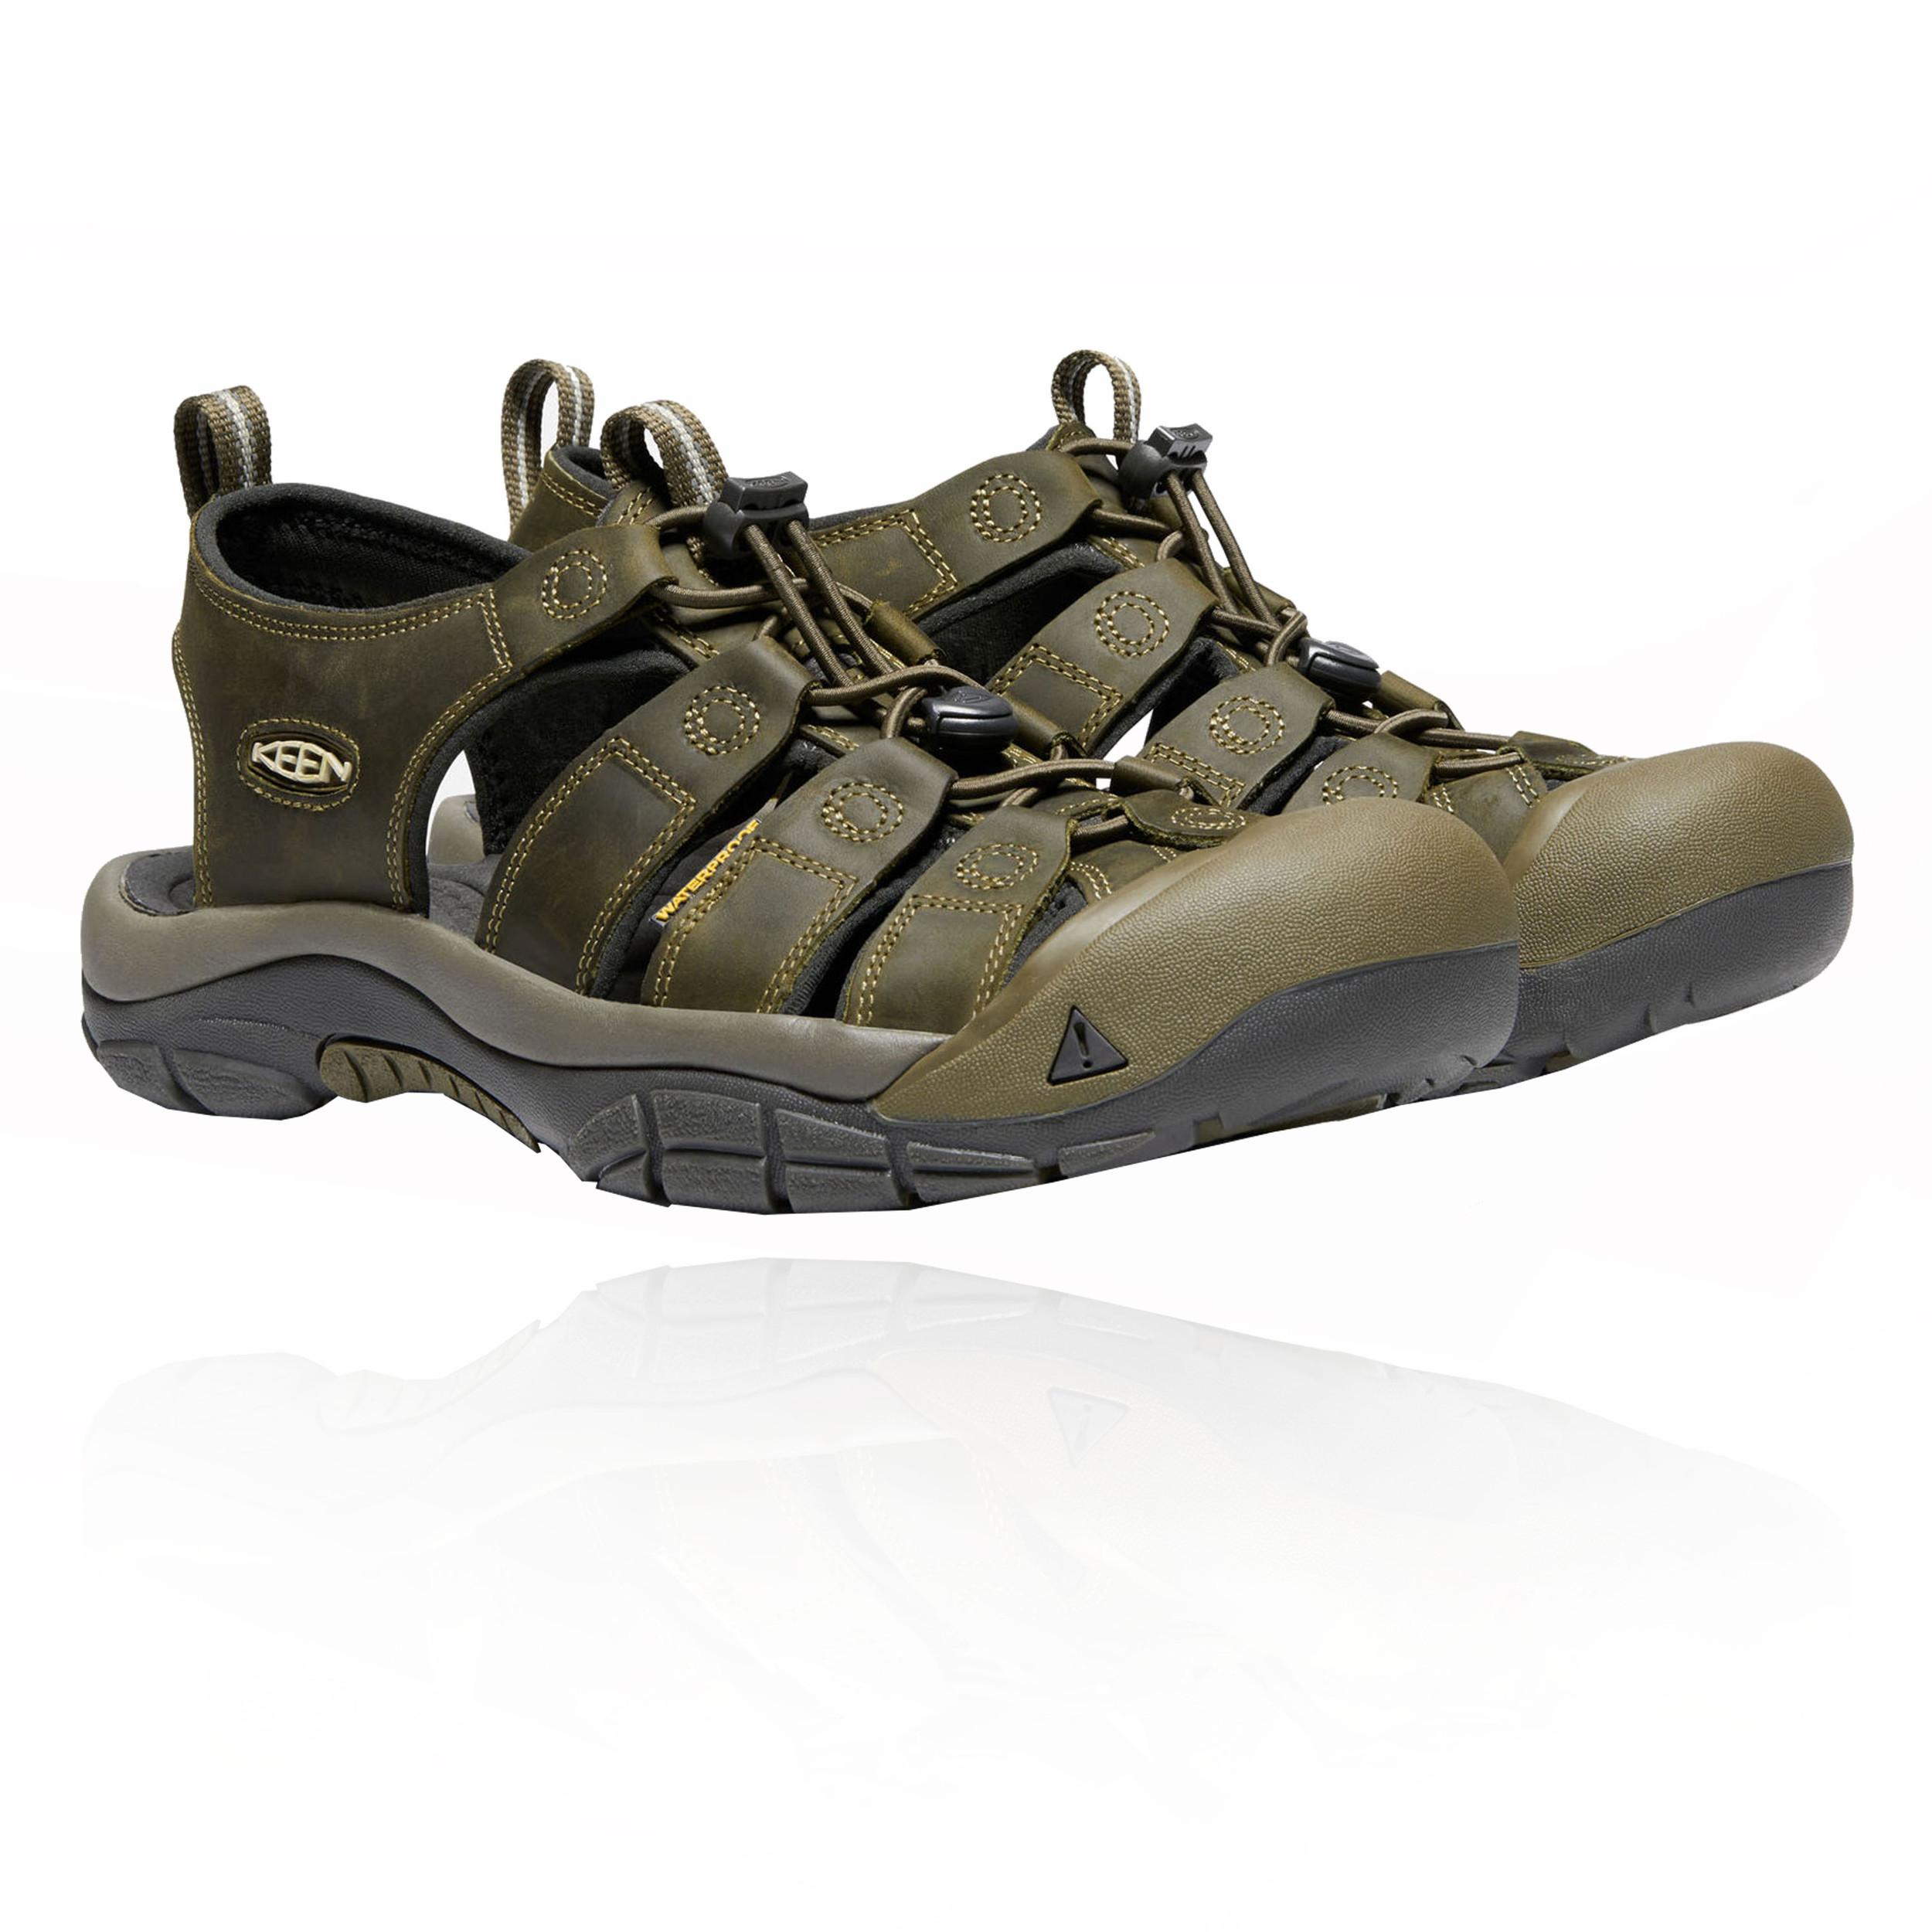 Sandali verdi per uomo Keen Newport LhU2r